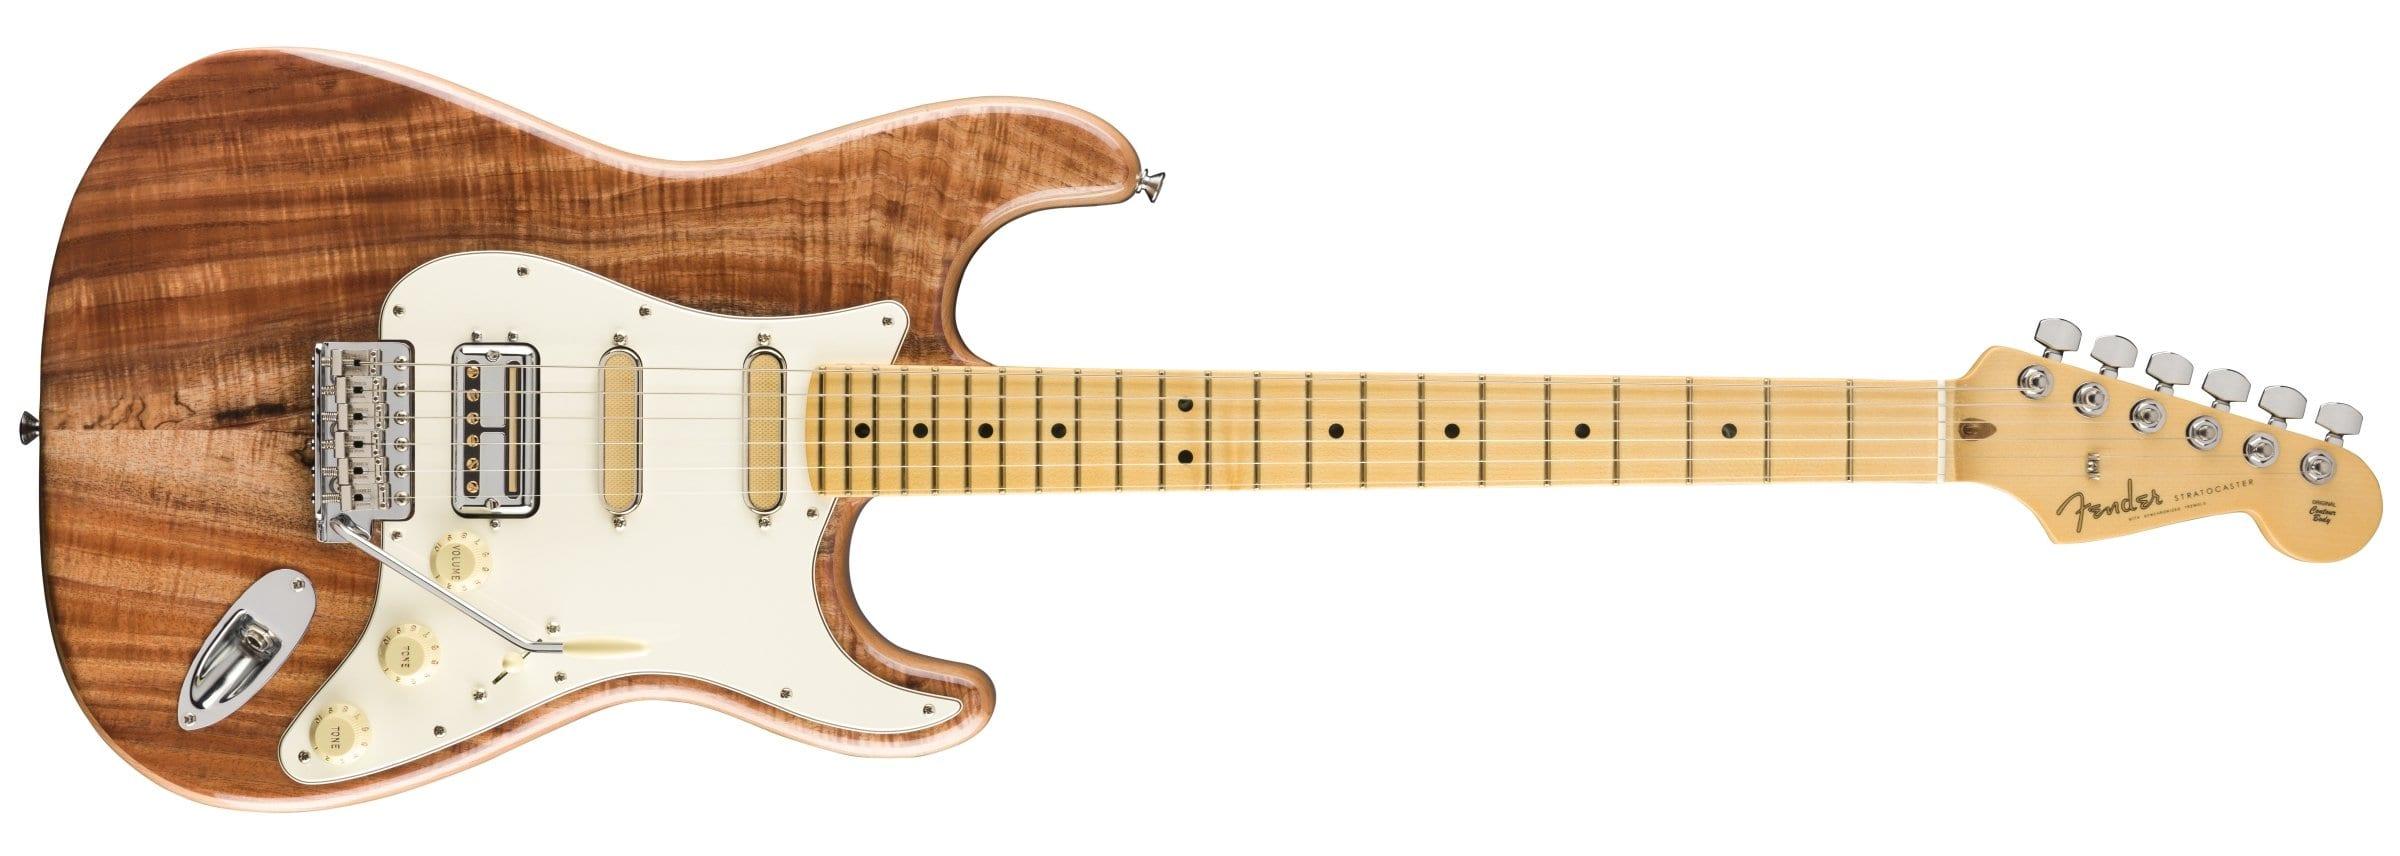 Fender Rarities Flame Koa Top Stratocaster